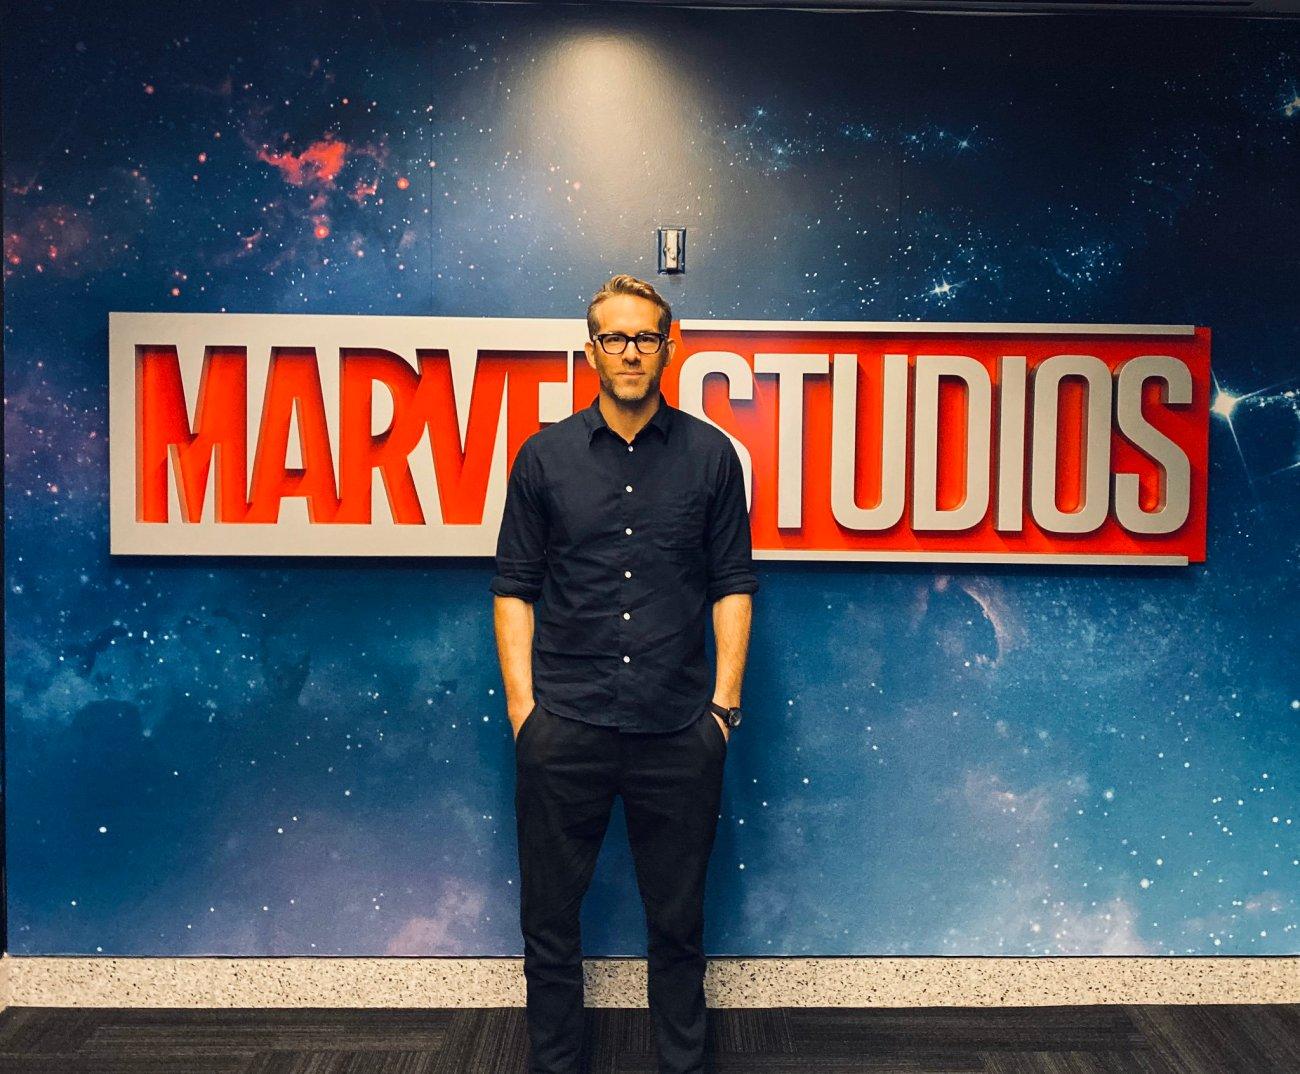 Ryan Reynolds en las oficinas de Marvel Studios. Imagen: Ryan Reynolds Twitter (@VancityReynolds).